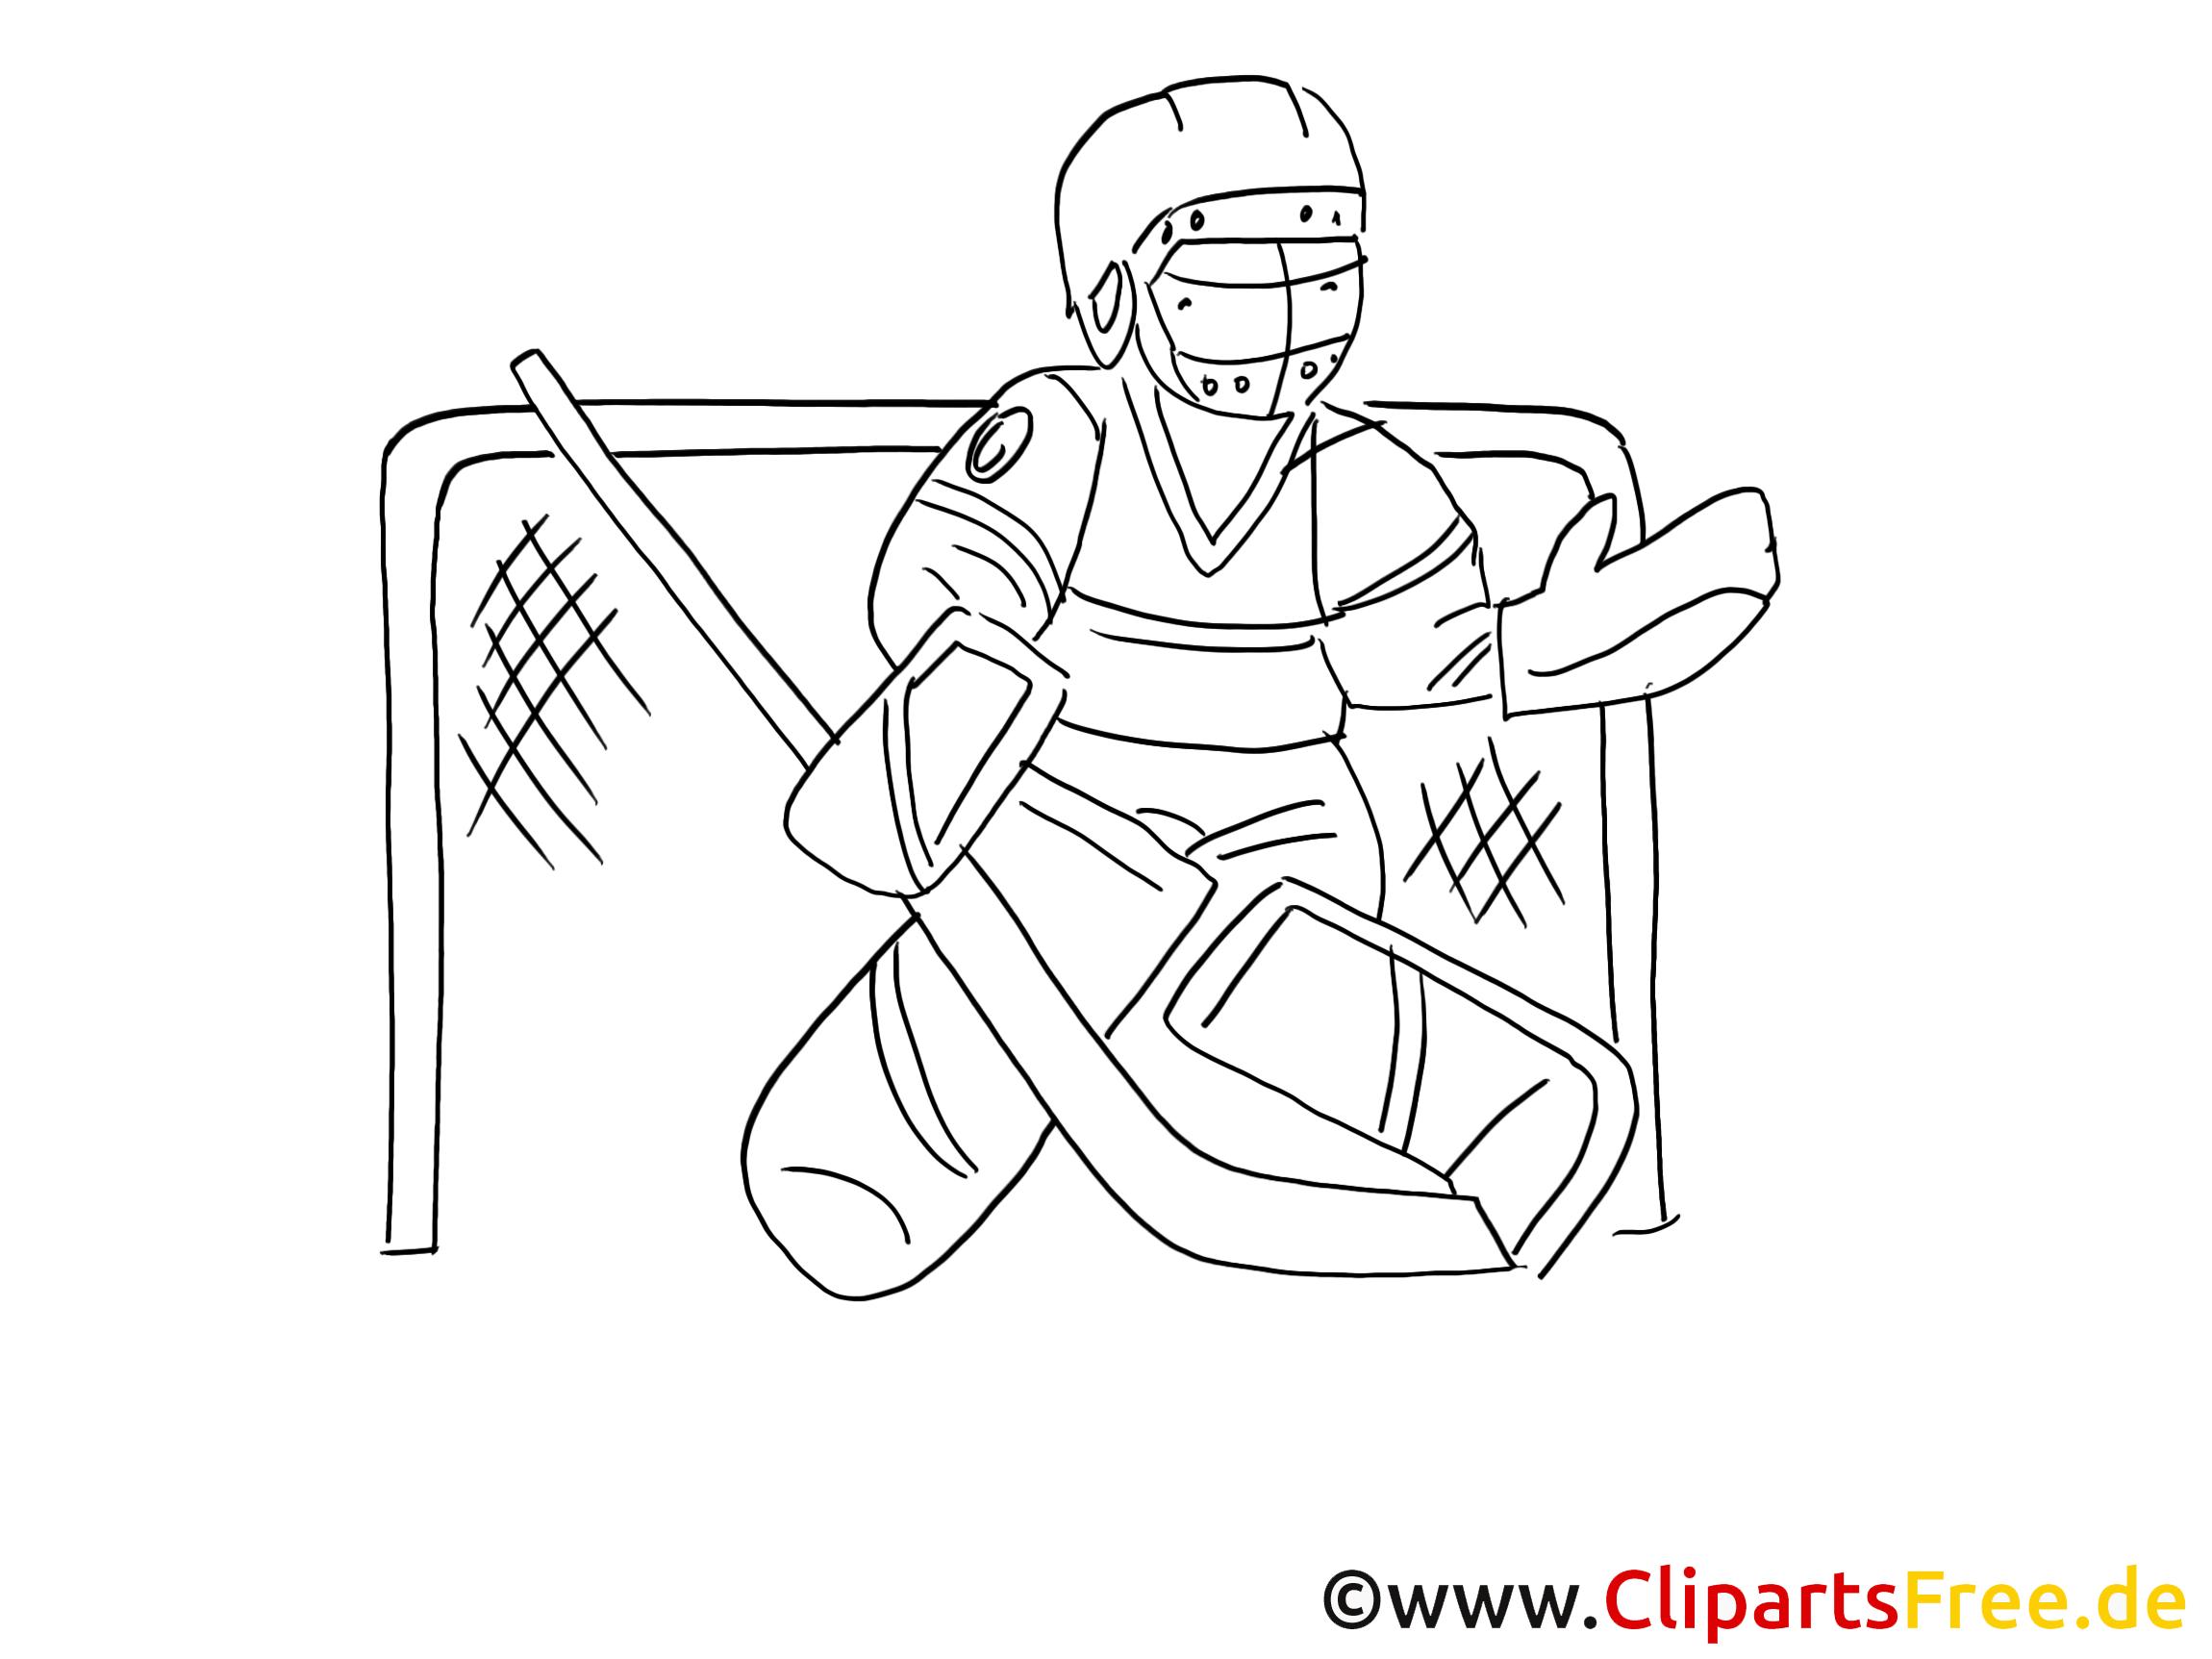 Gardien de but hockey illustration imprimer hockey sur - Dessin gardien de but ...